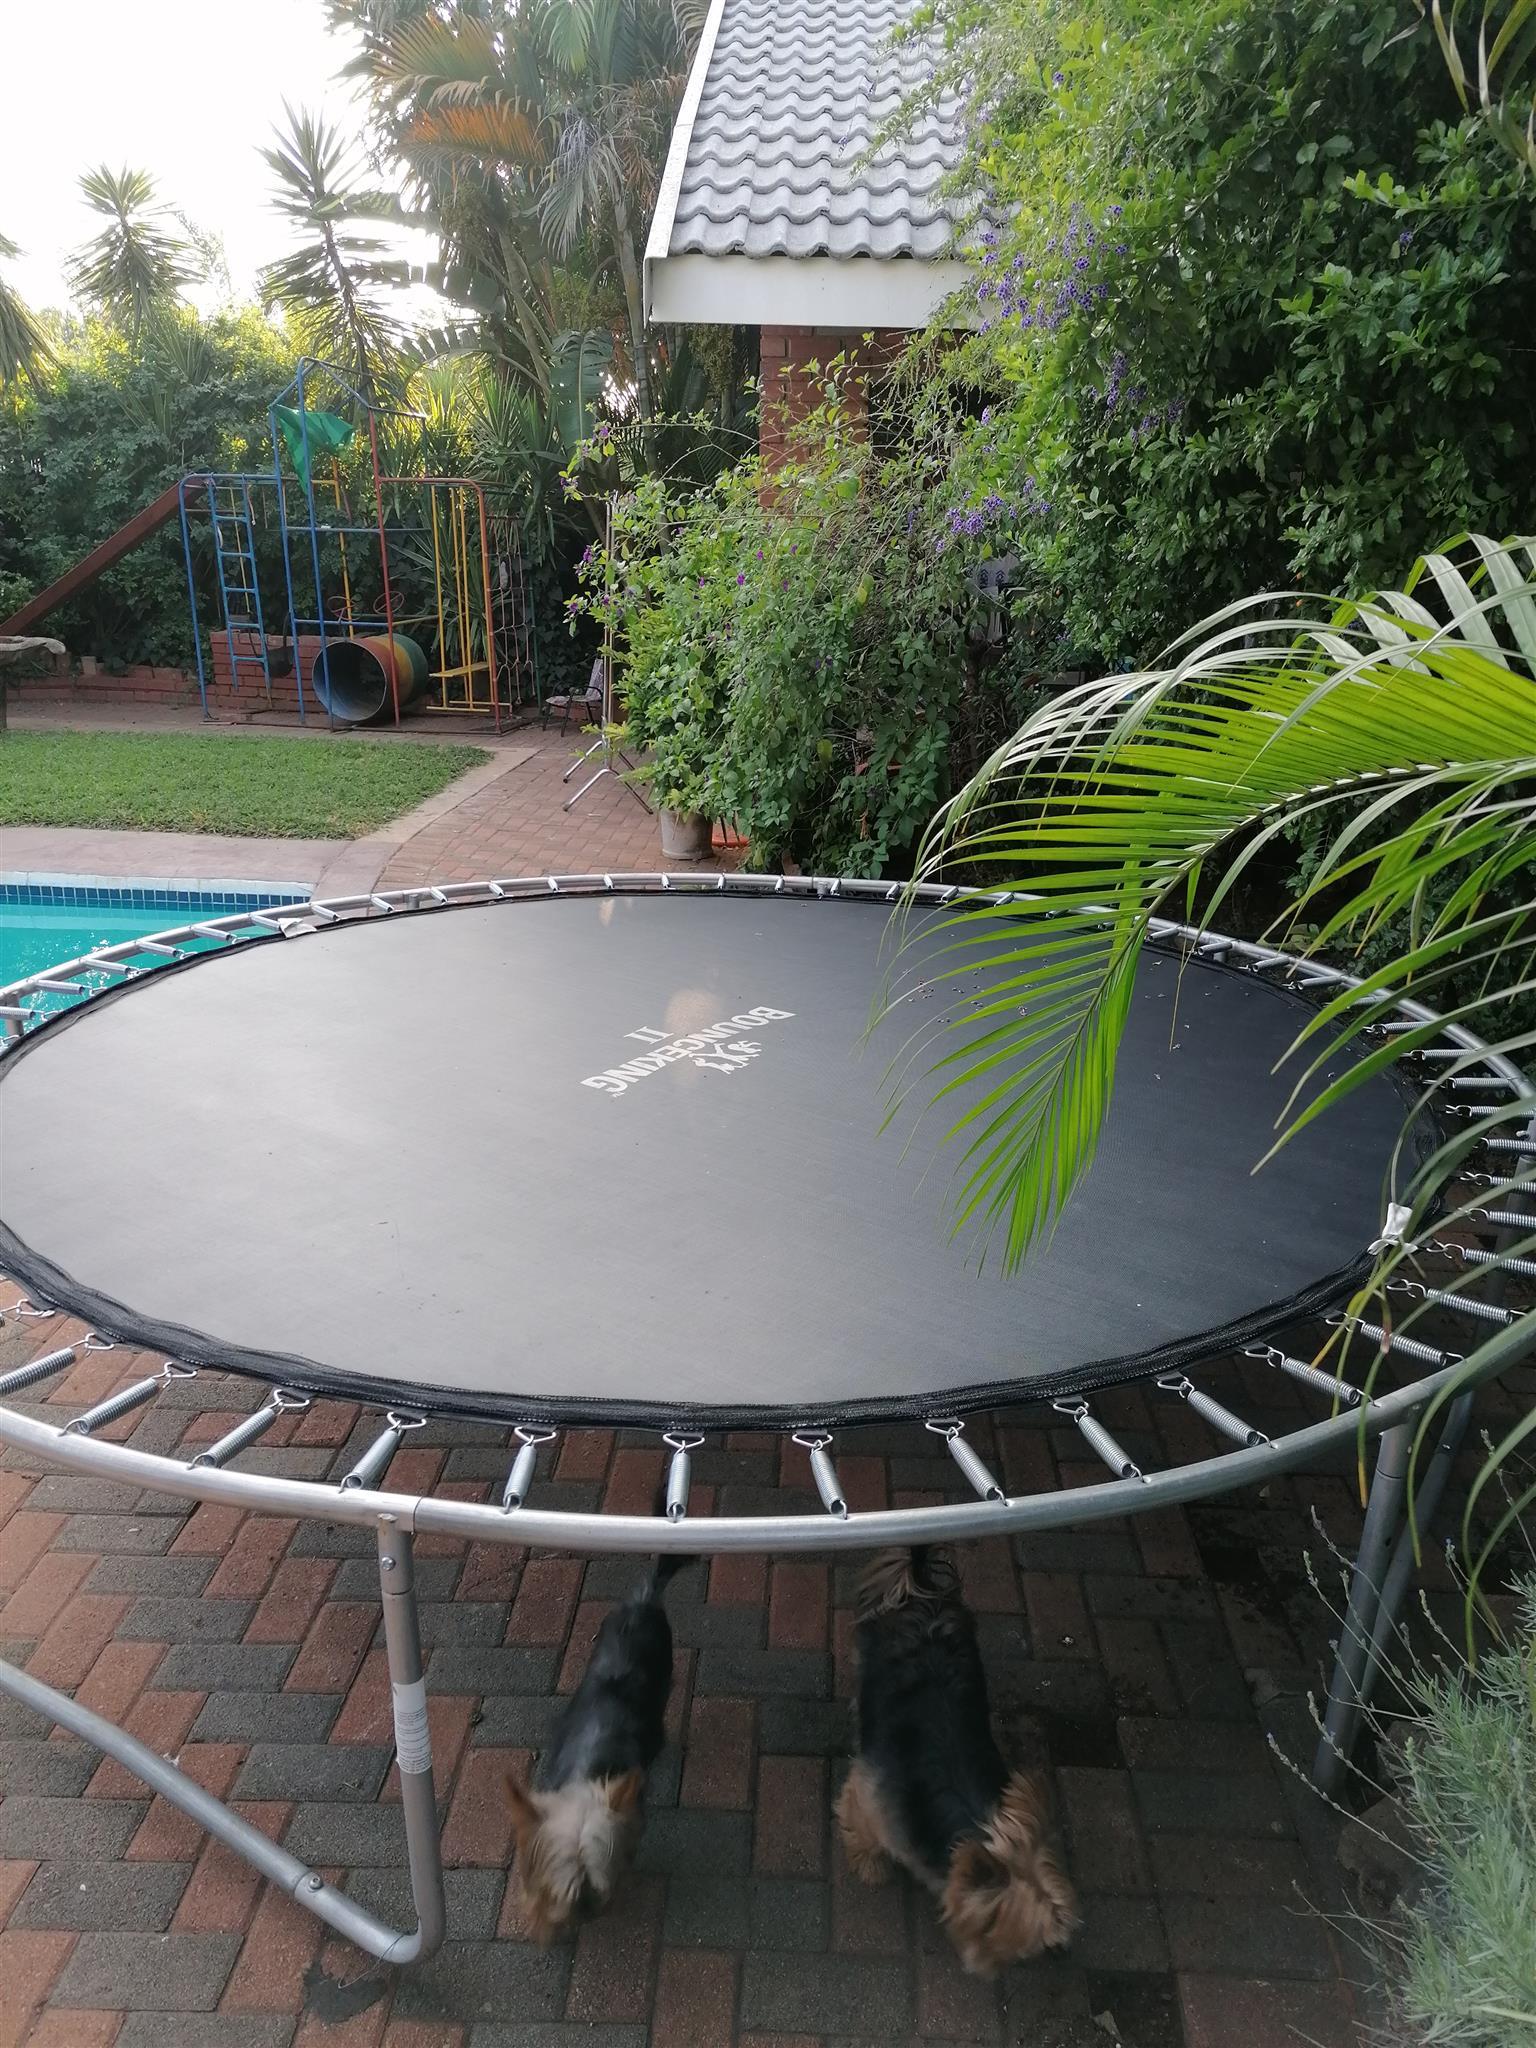 BounceKing trampoline 2,60m diameter. Excellent condition. R1500.